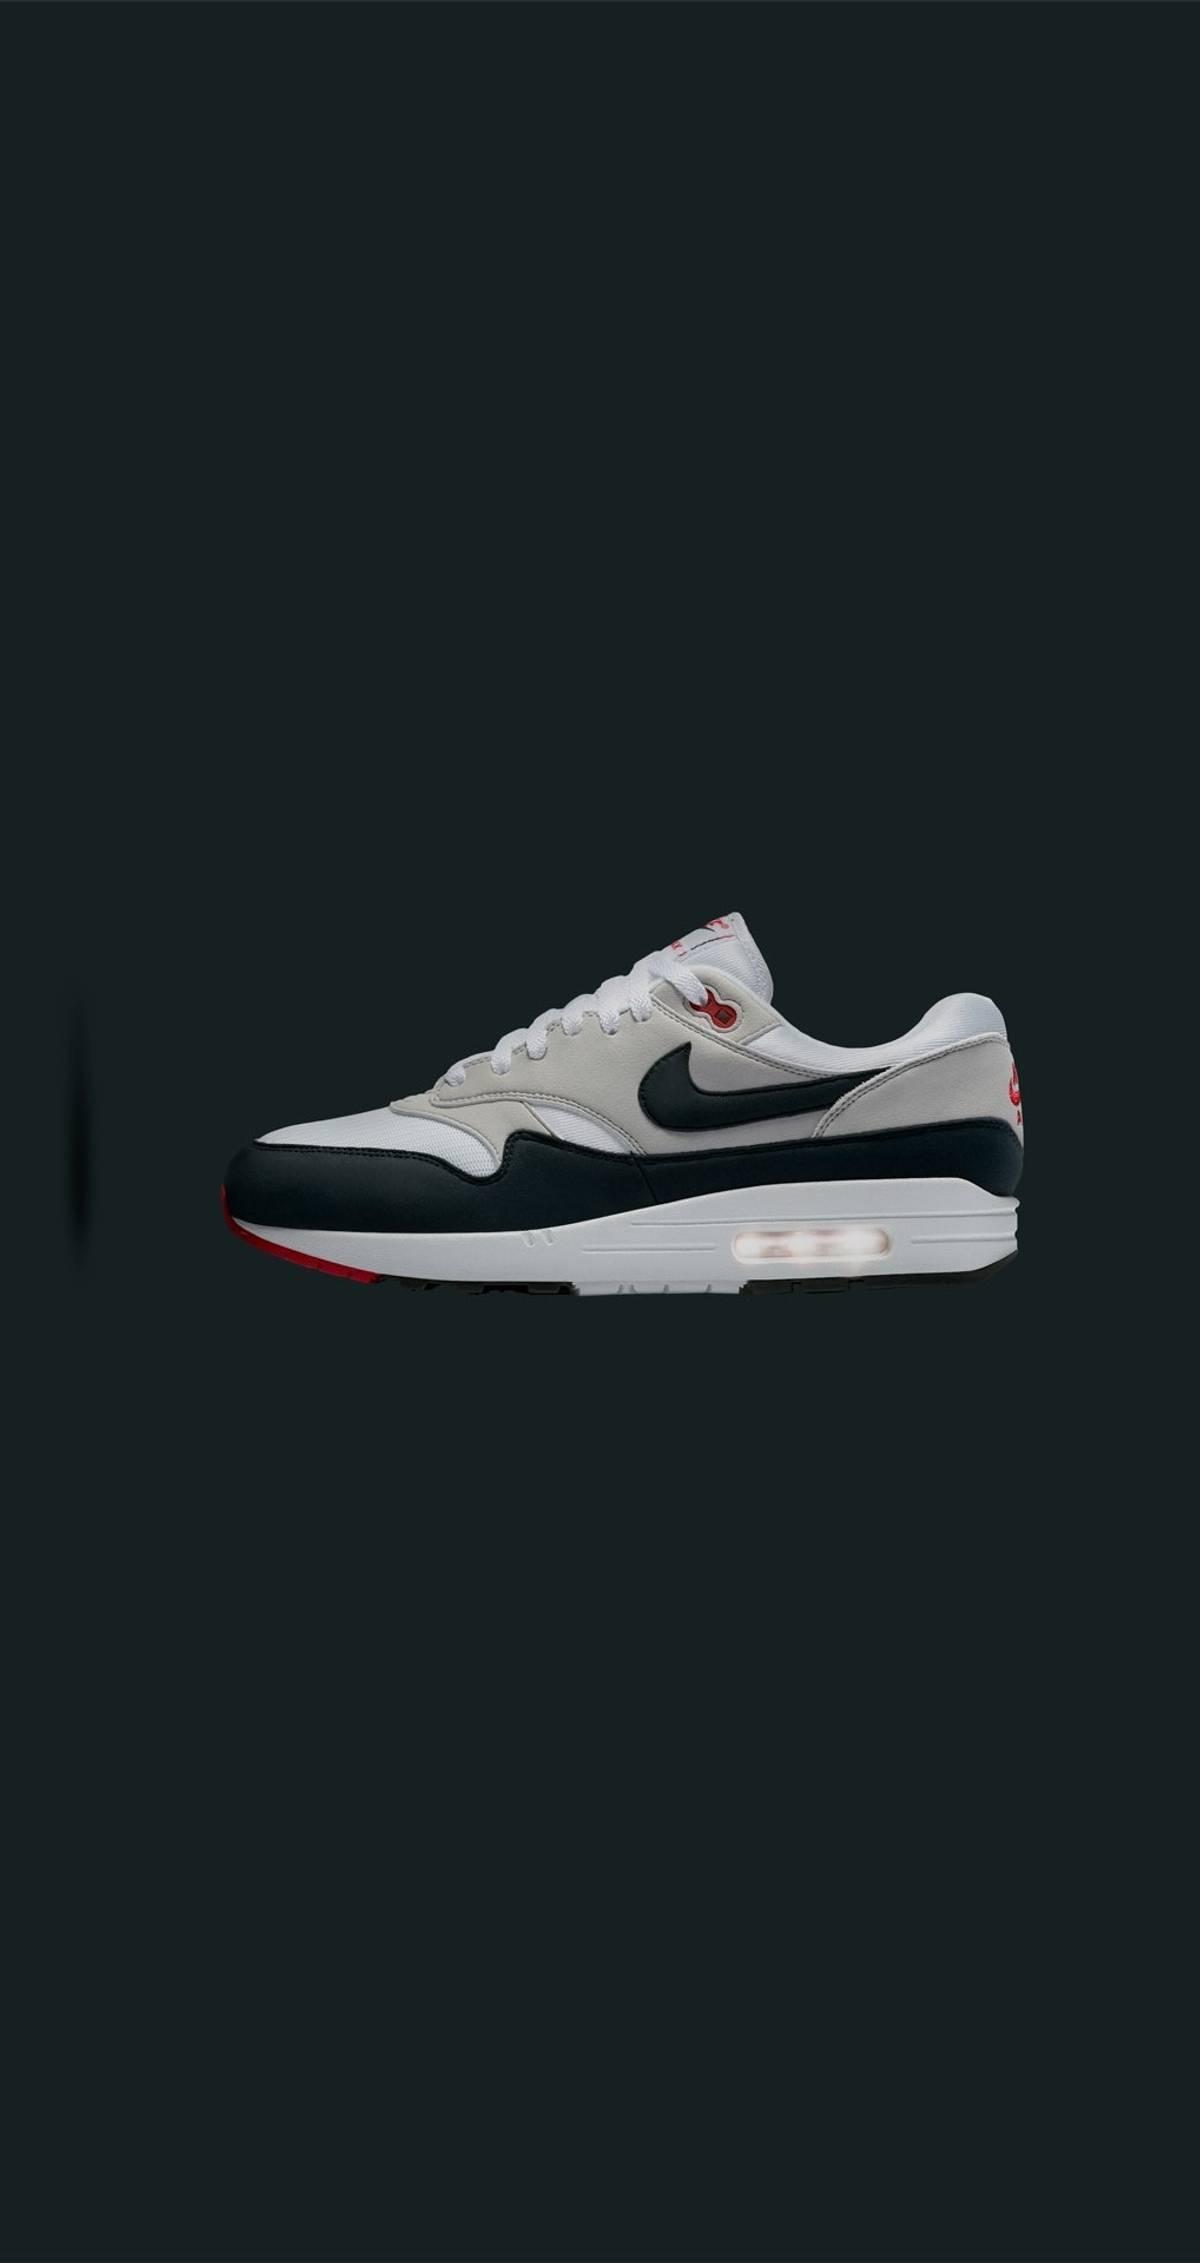 ed297b9cdc Nike Nike Air Max 1 '30th Anniversary' Obsidian & White 908375 104 ...